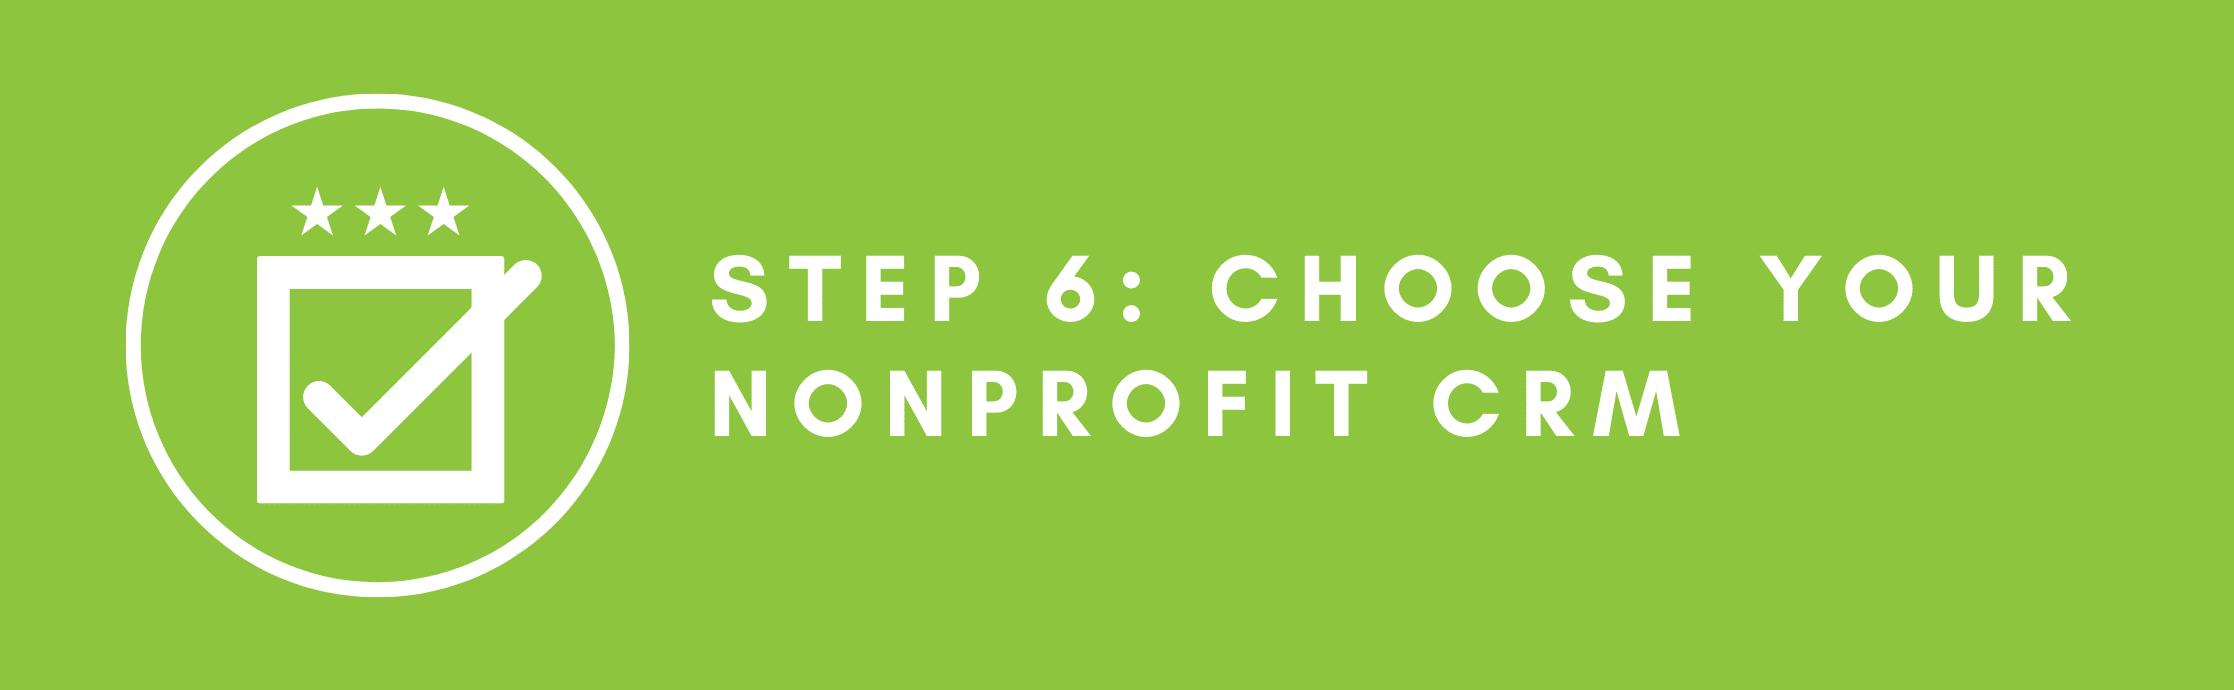 choosing-nonprofit-crm-software-step-6